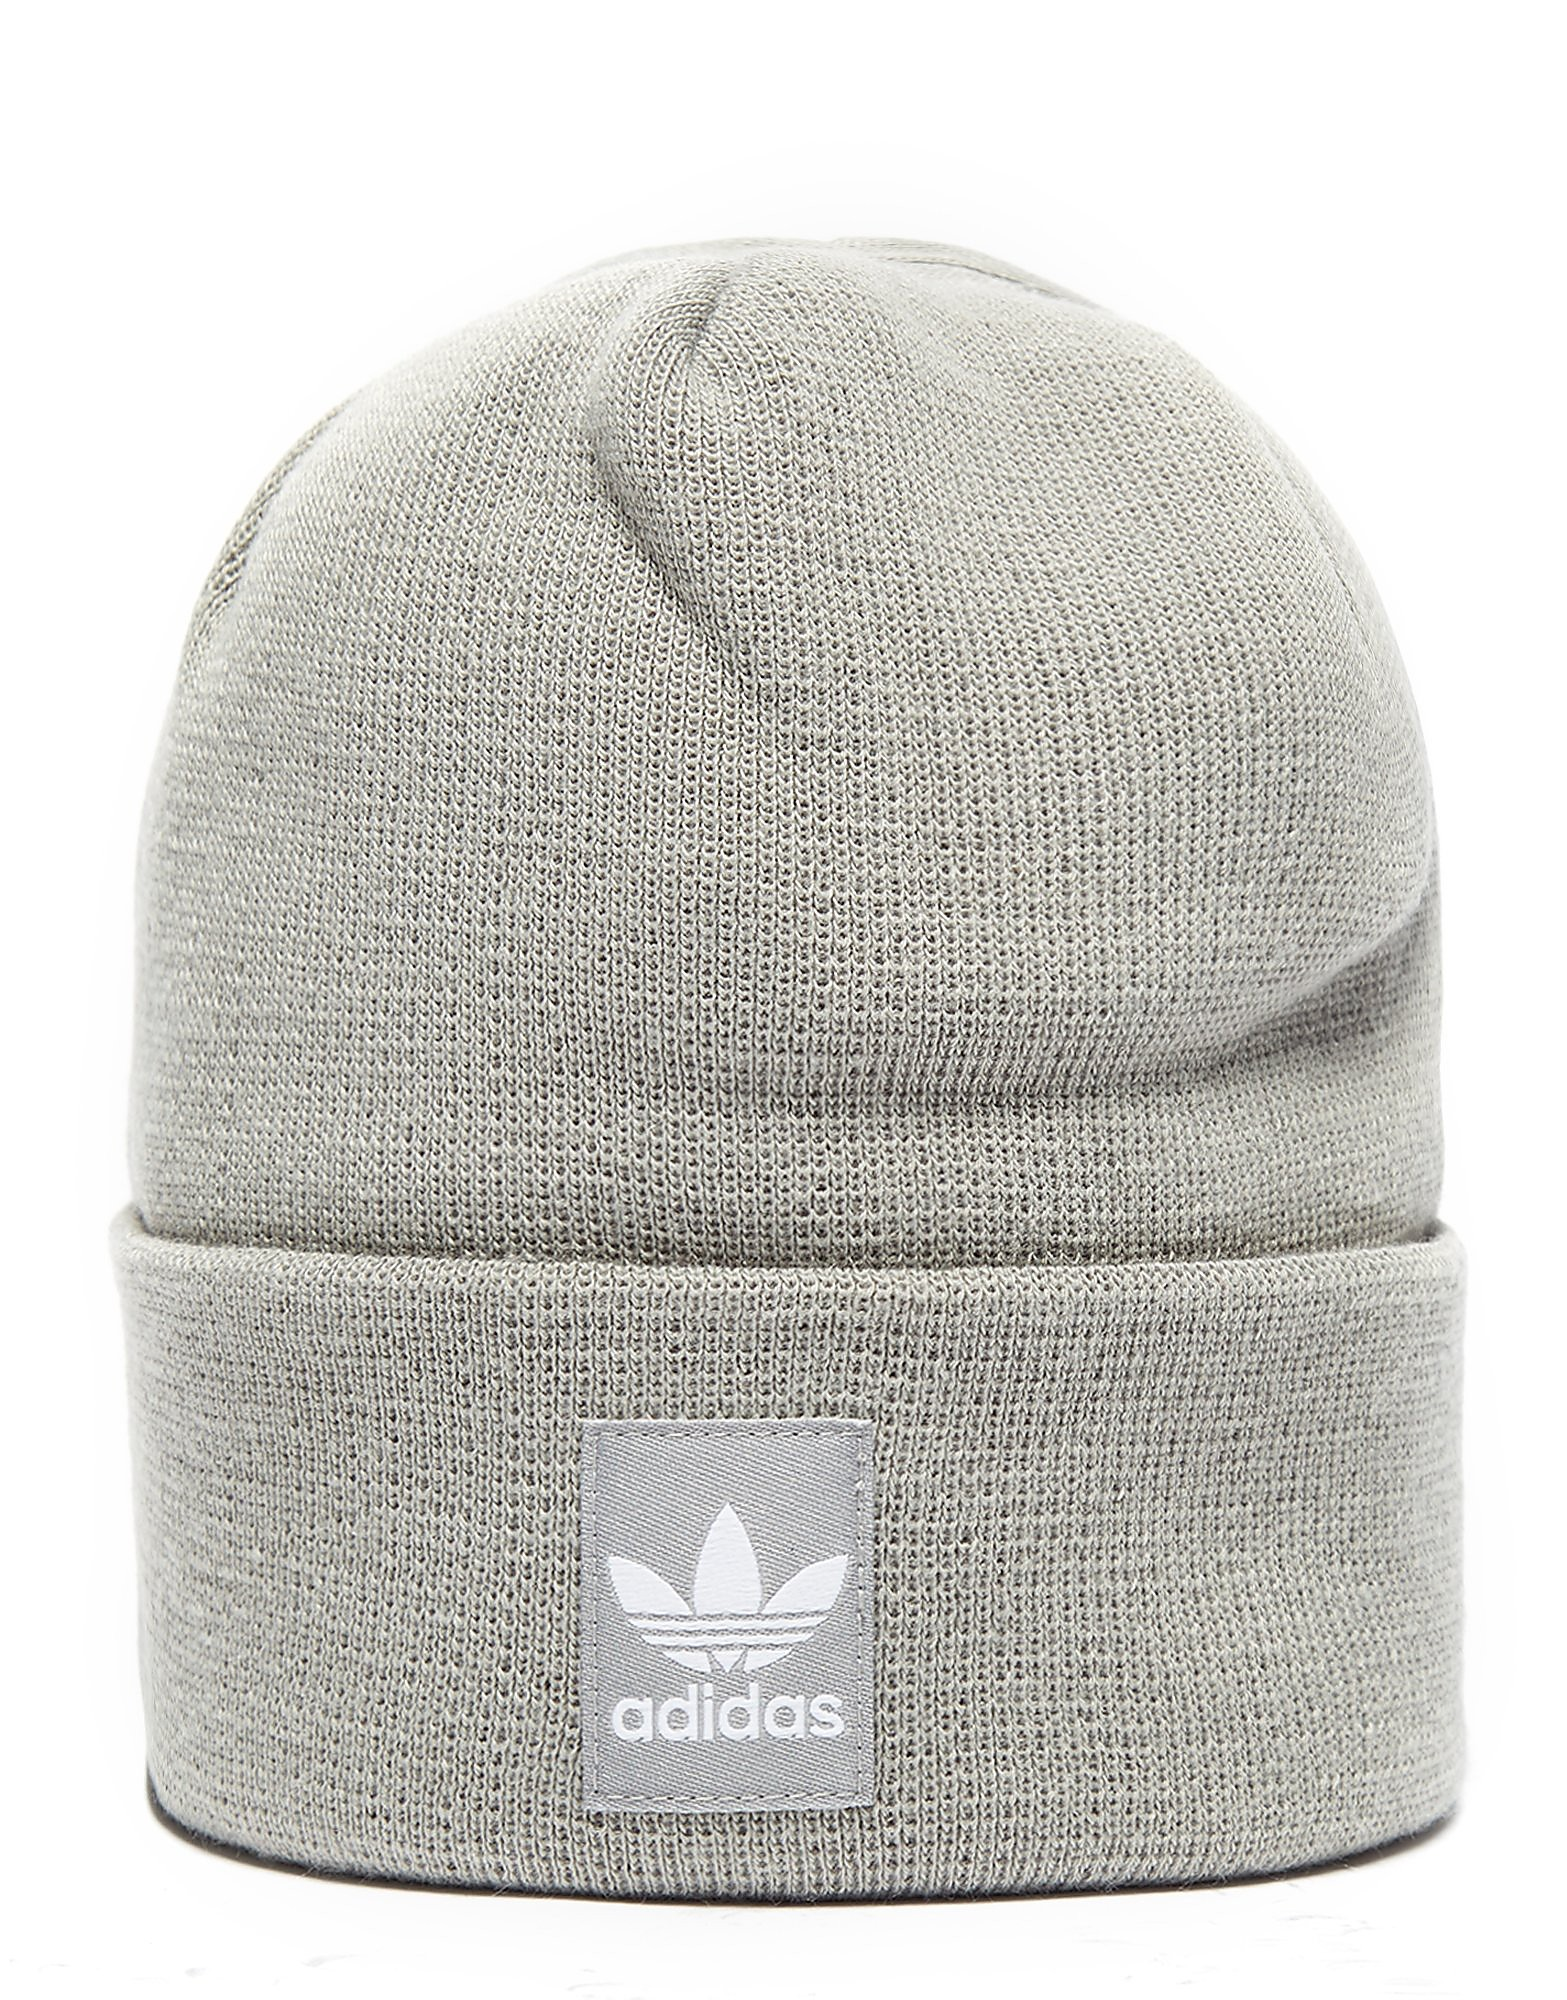 adidas Originals Ribbed Logo Beanie Hat